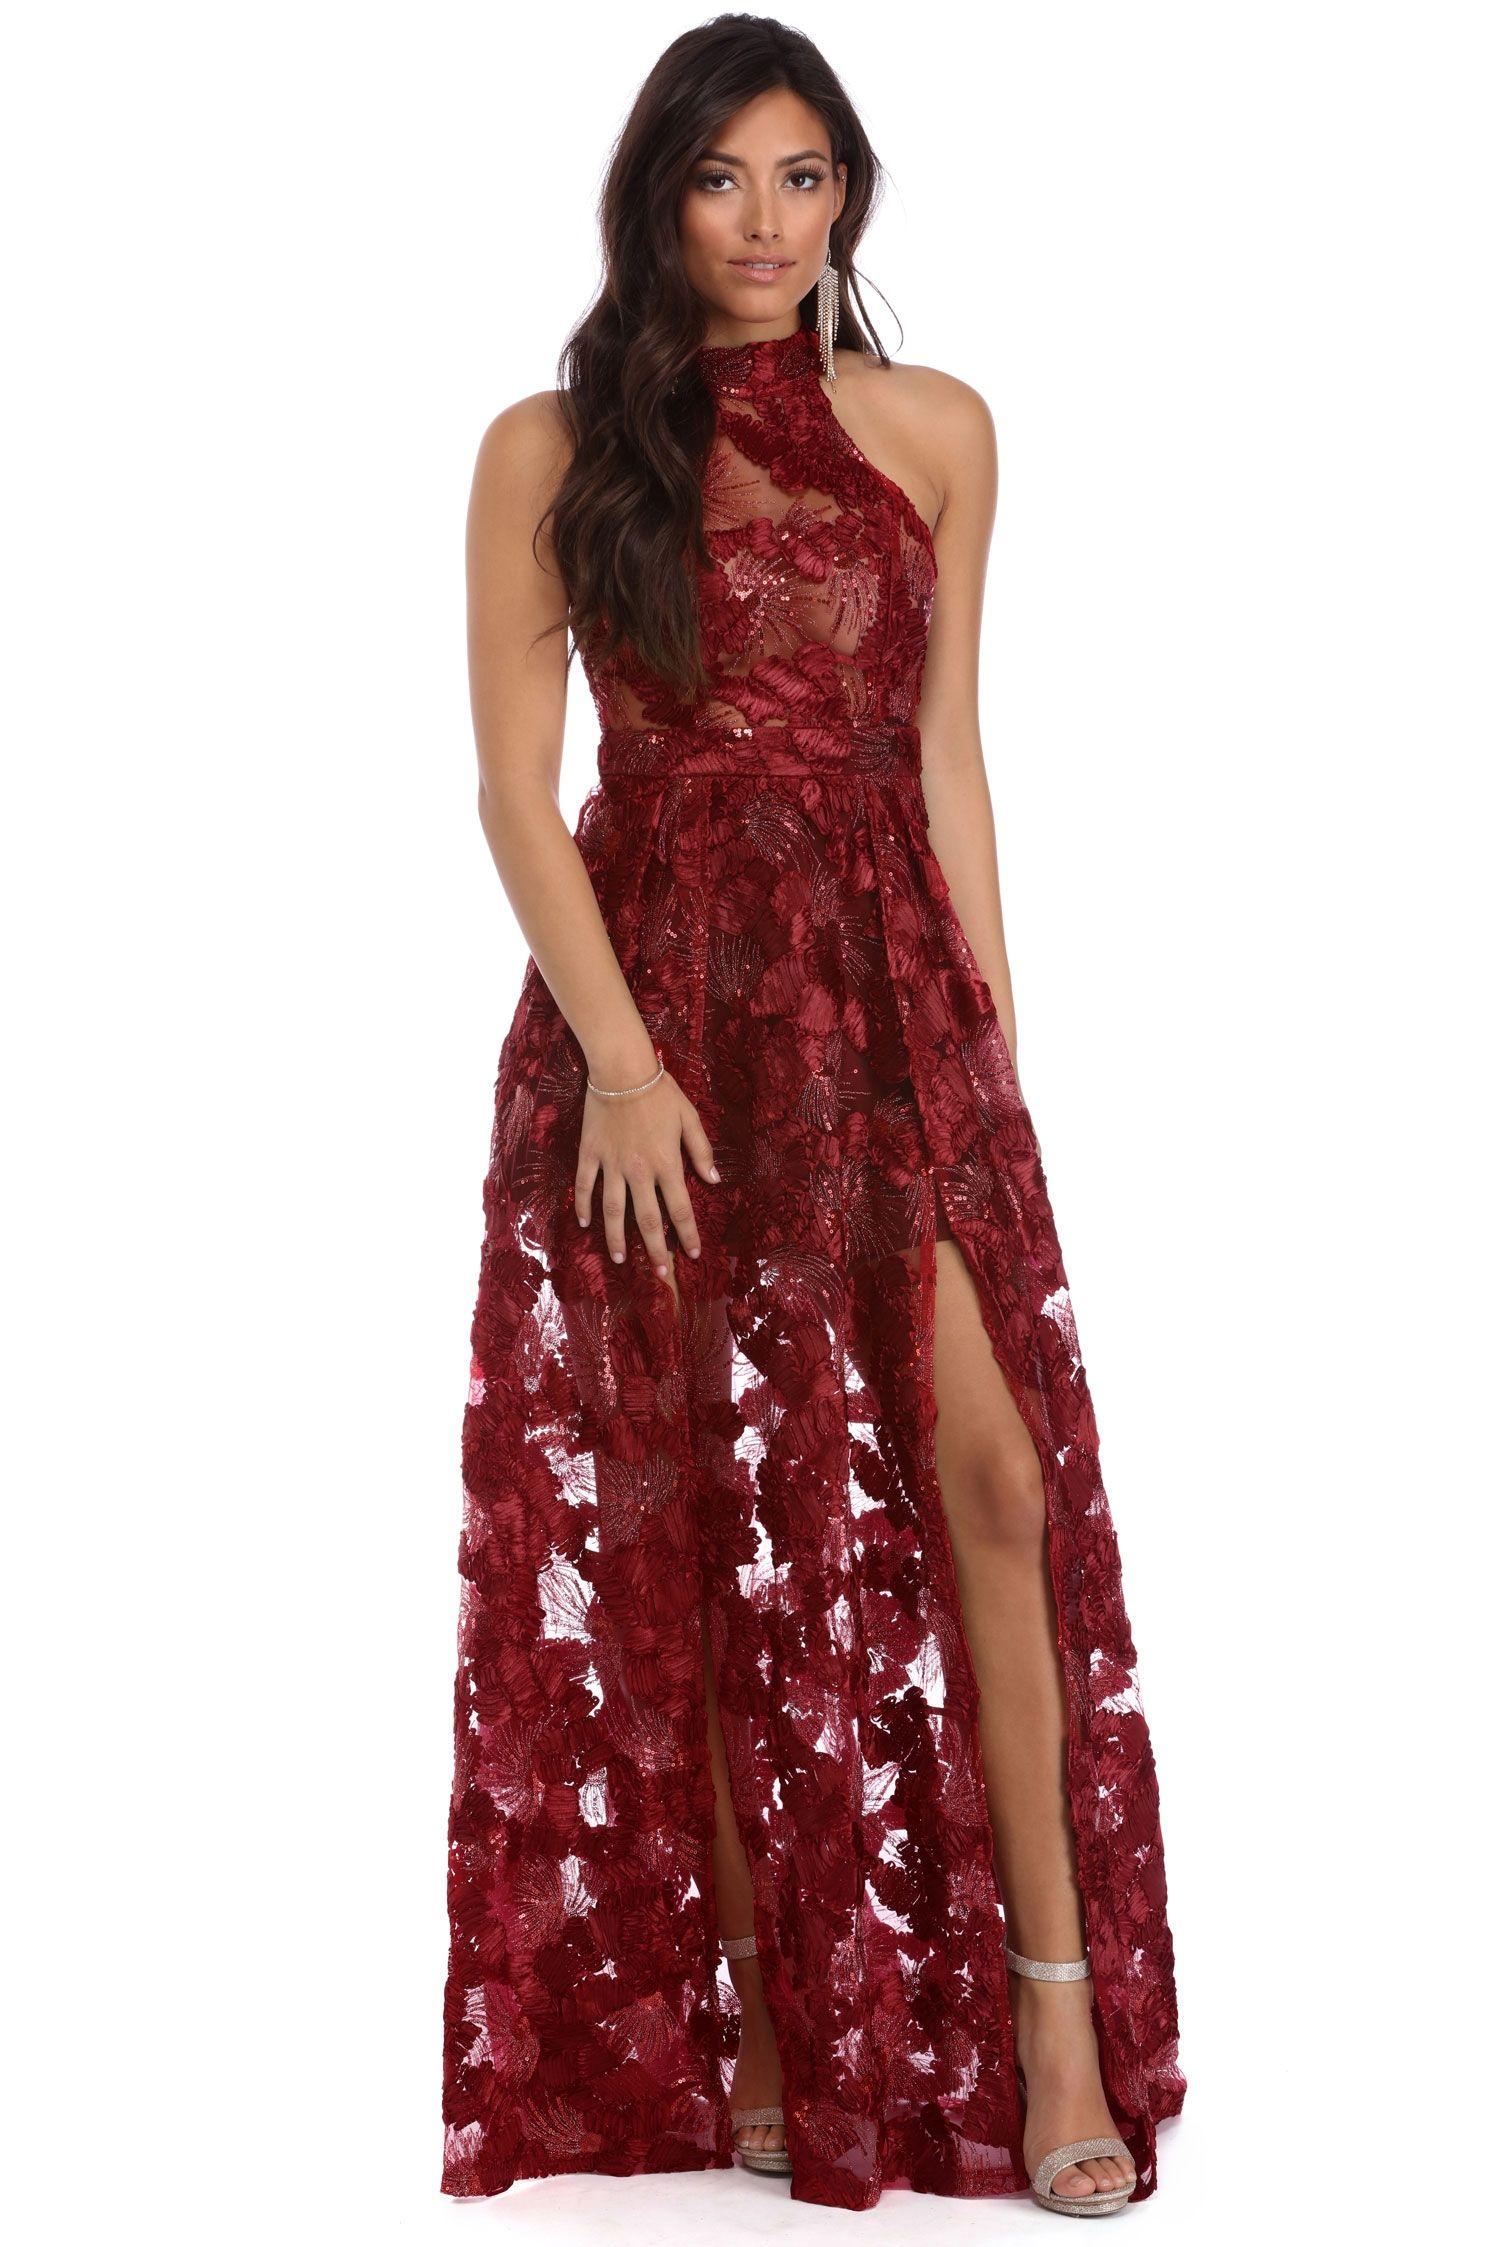 ac58dd9f1d8 Kalea Burgundy Fiery Sunset Dress Windsor Dresses Homecoming